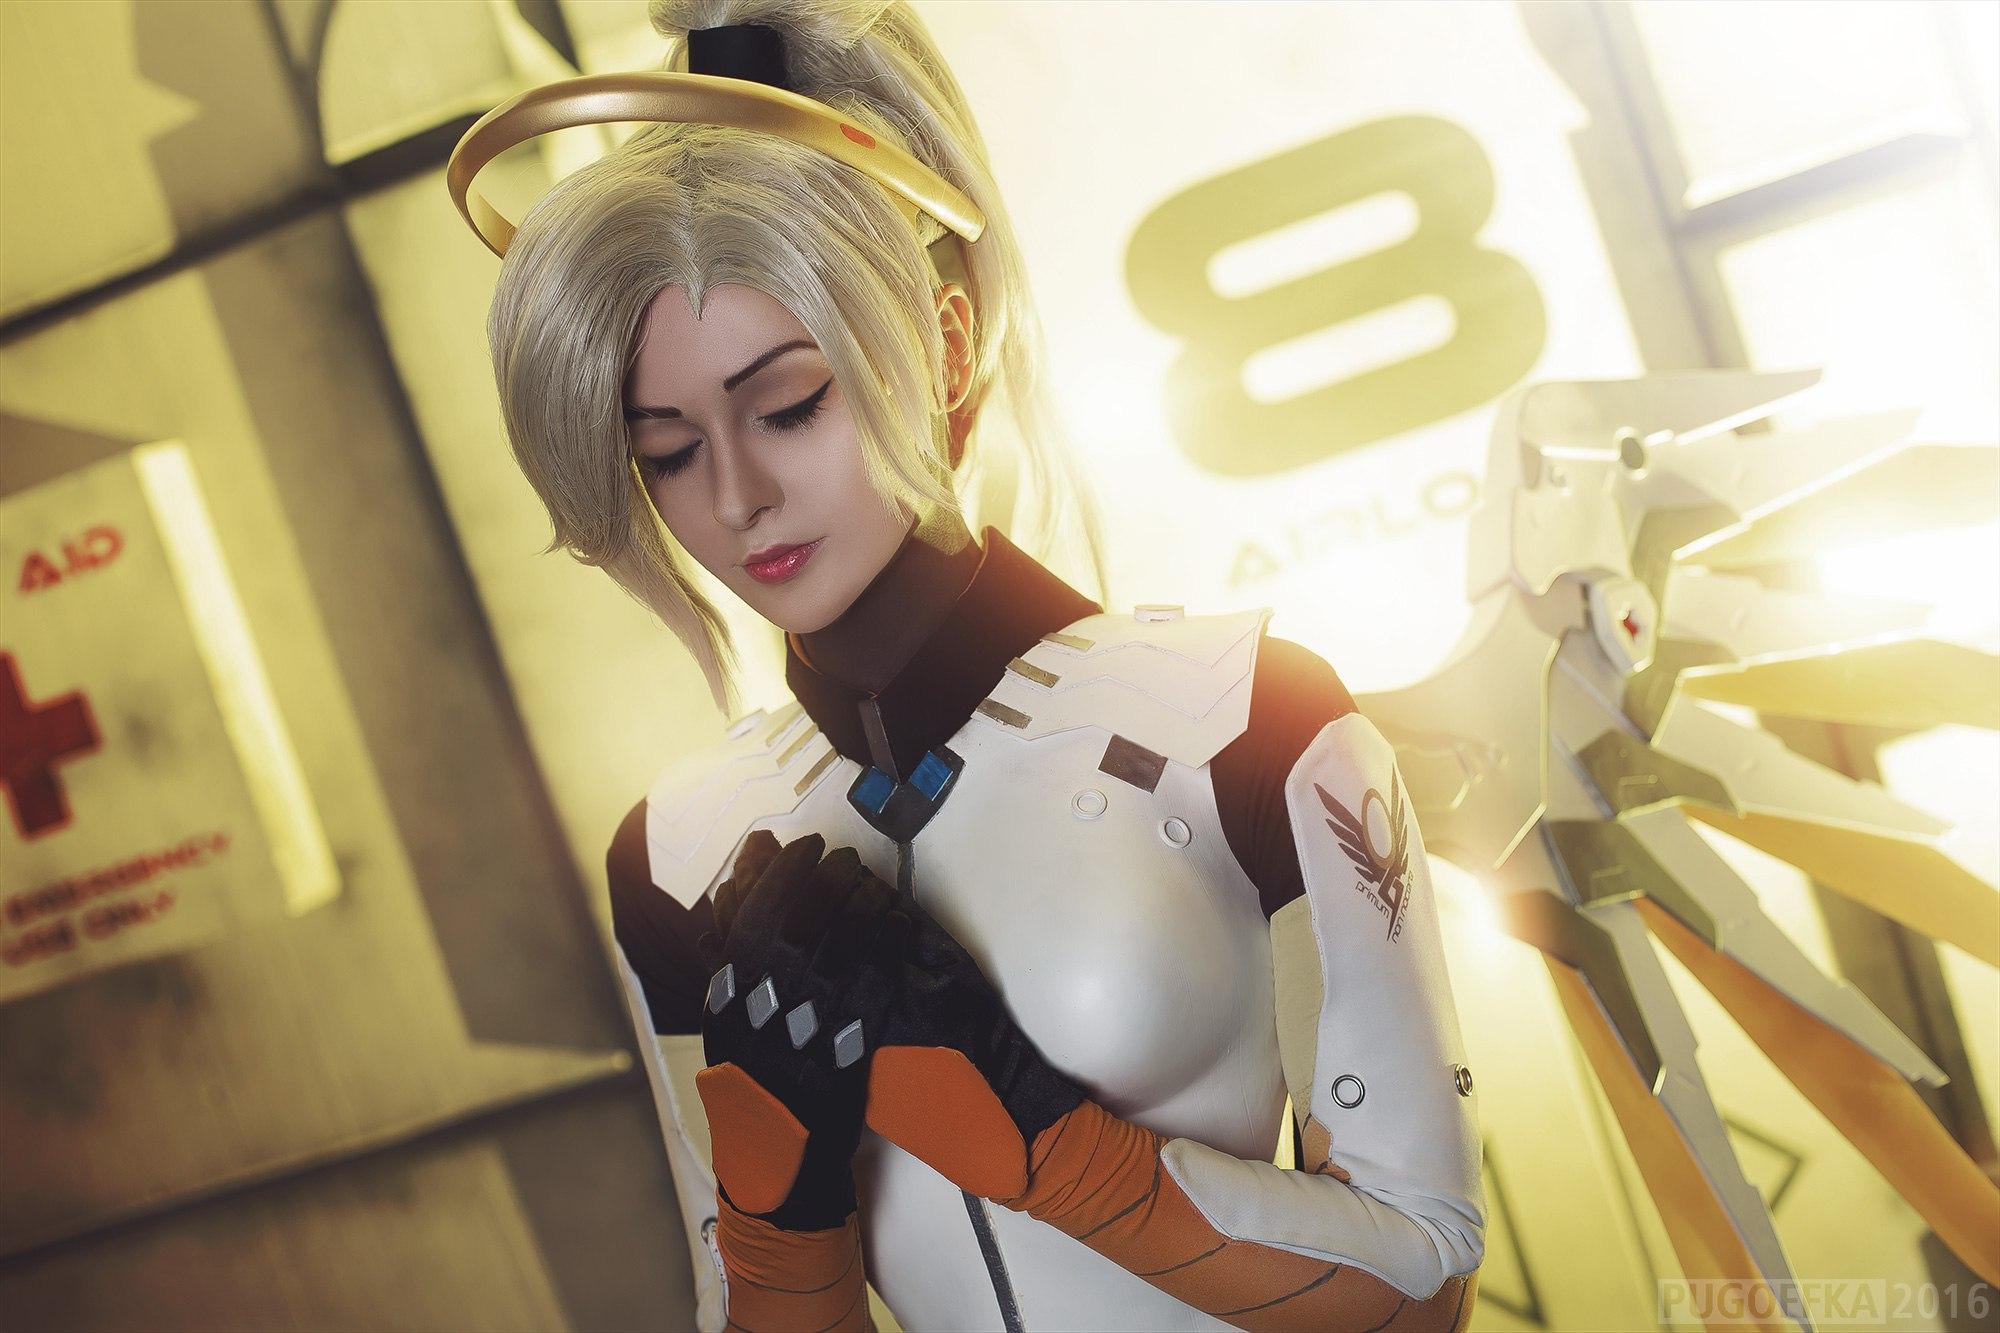 aswVgdL Cosplay - Overwatch - Mercy #142